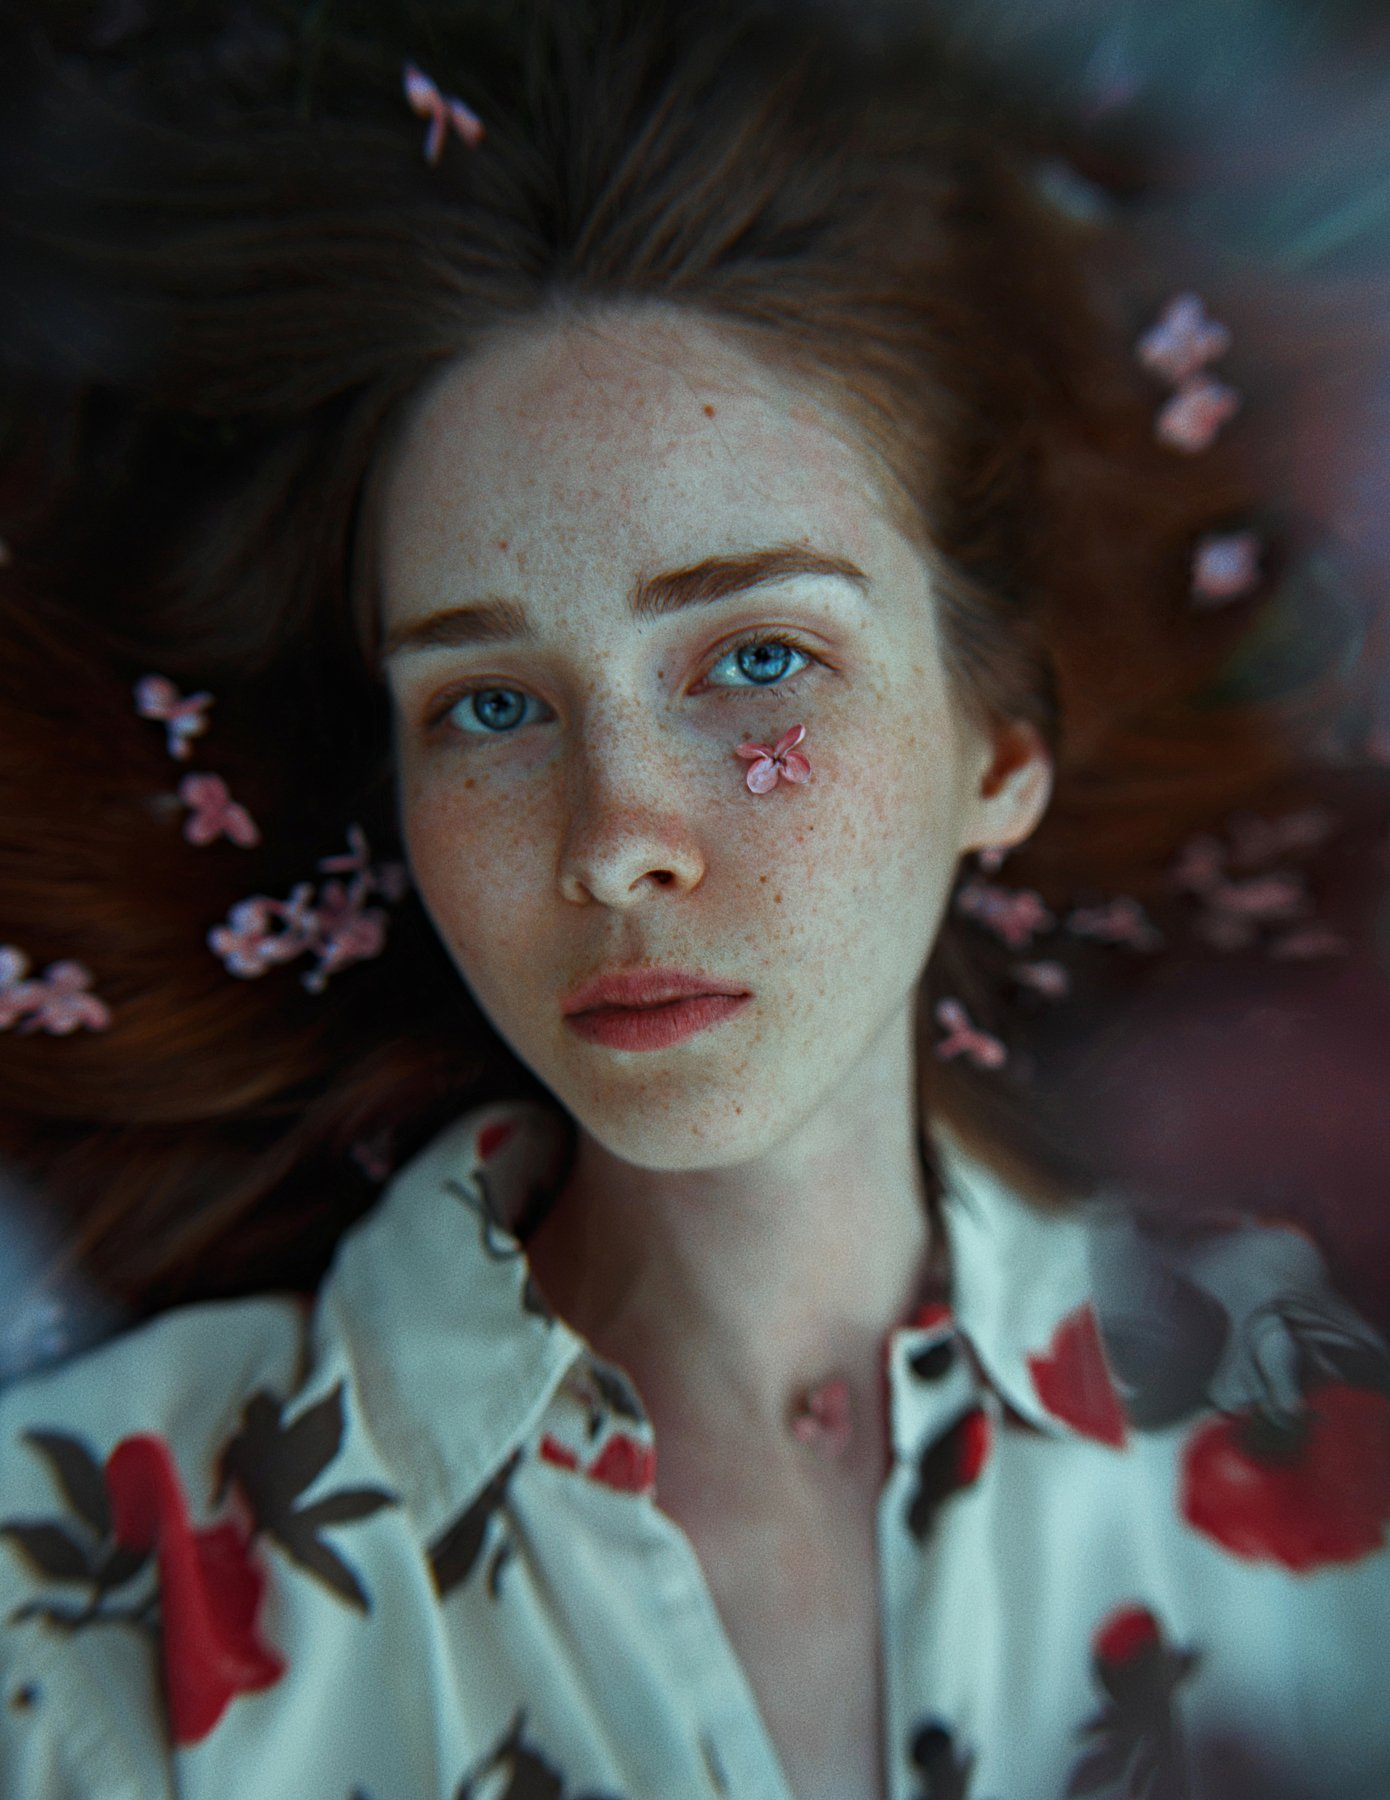 portrait, портрет, girl, redhair, portraiture, outdoor, девушка, молодость, май, весна, spring, lilac, retouch, ретушь, цвет, сирень, Фишар Павел